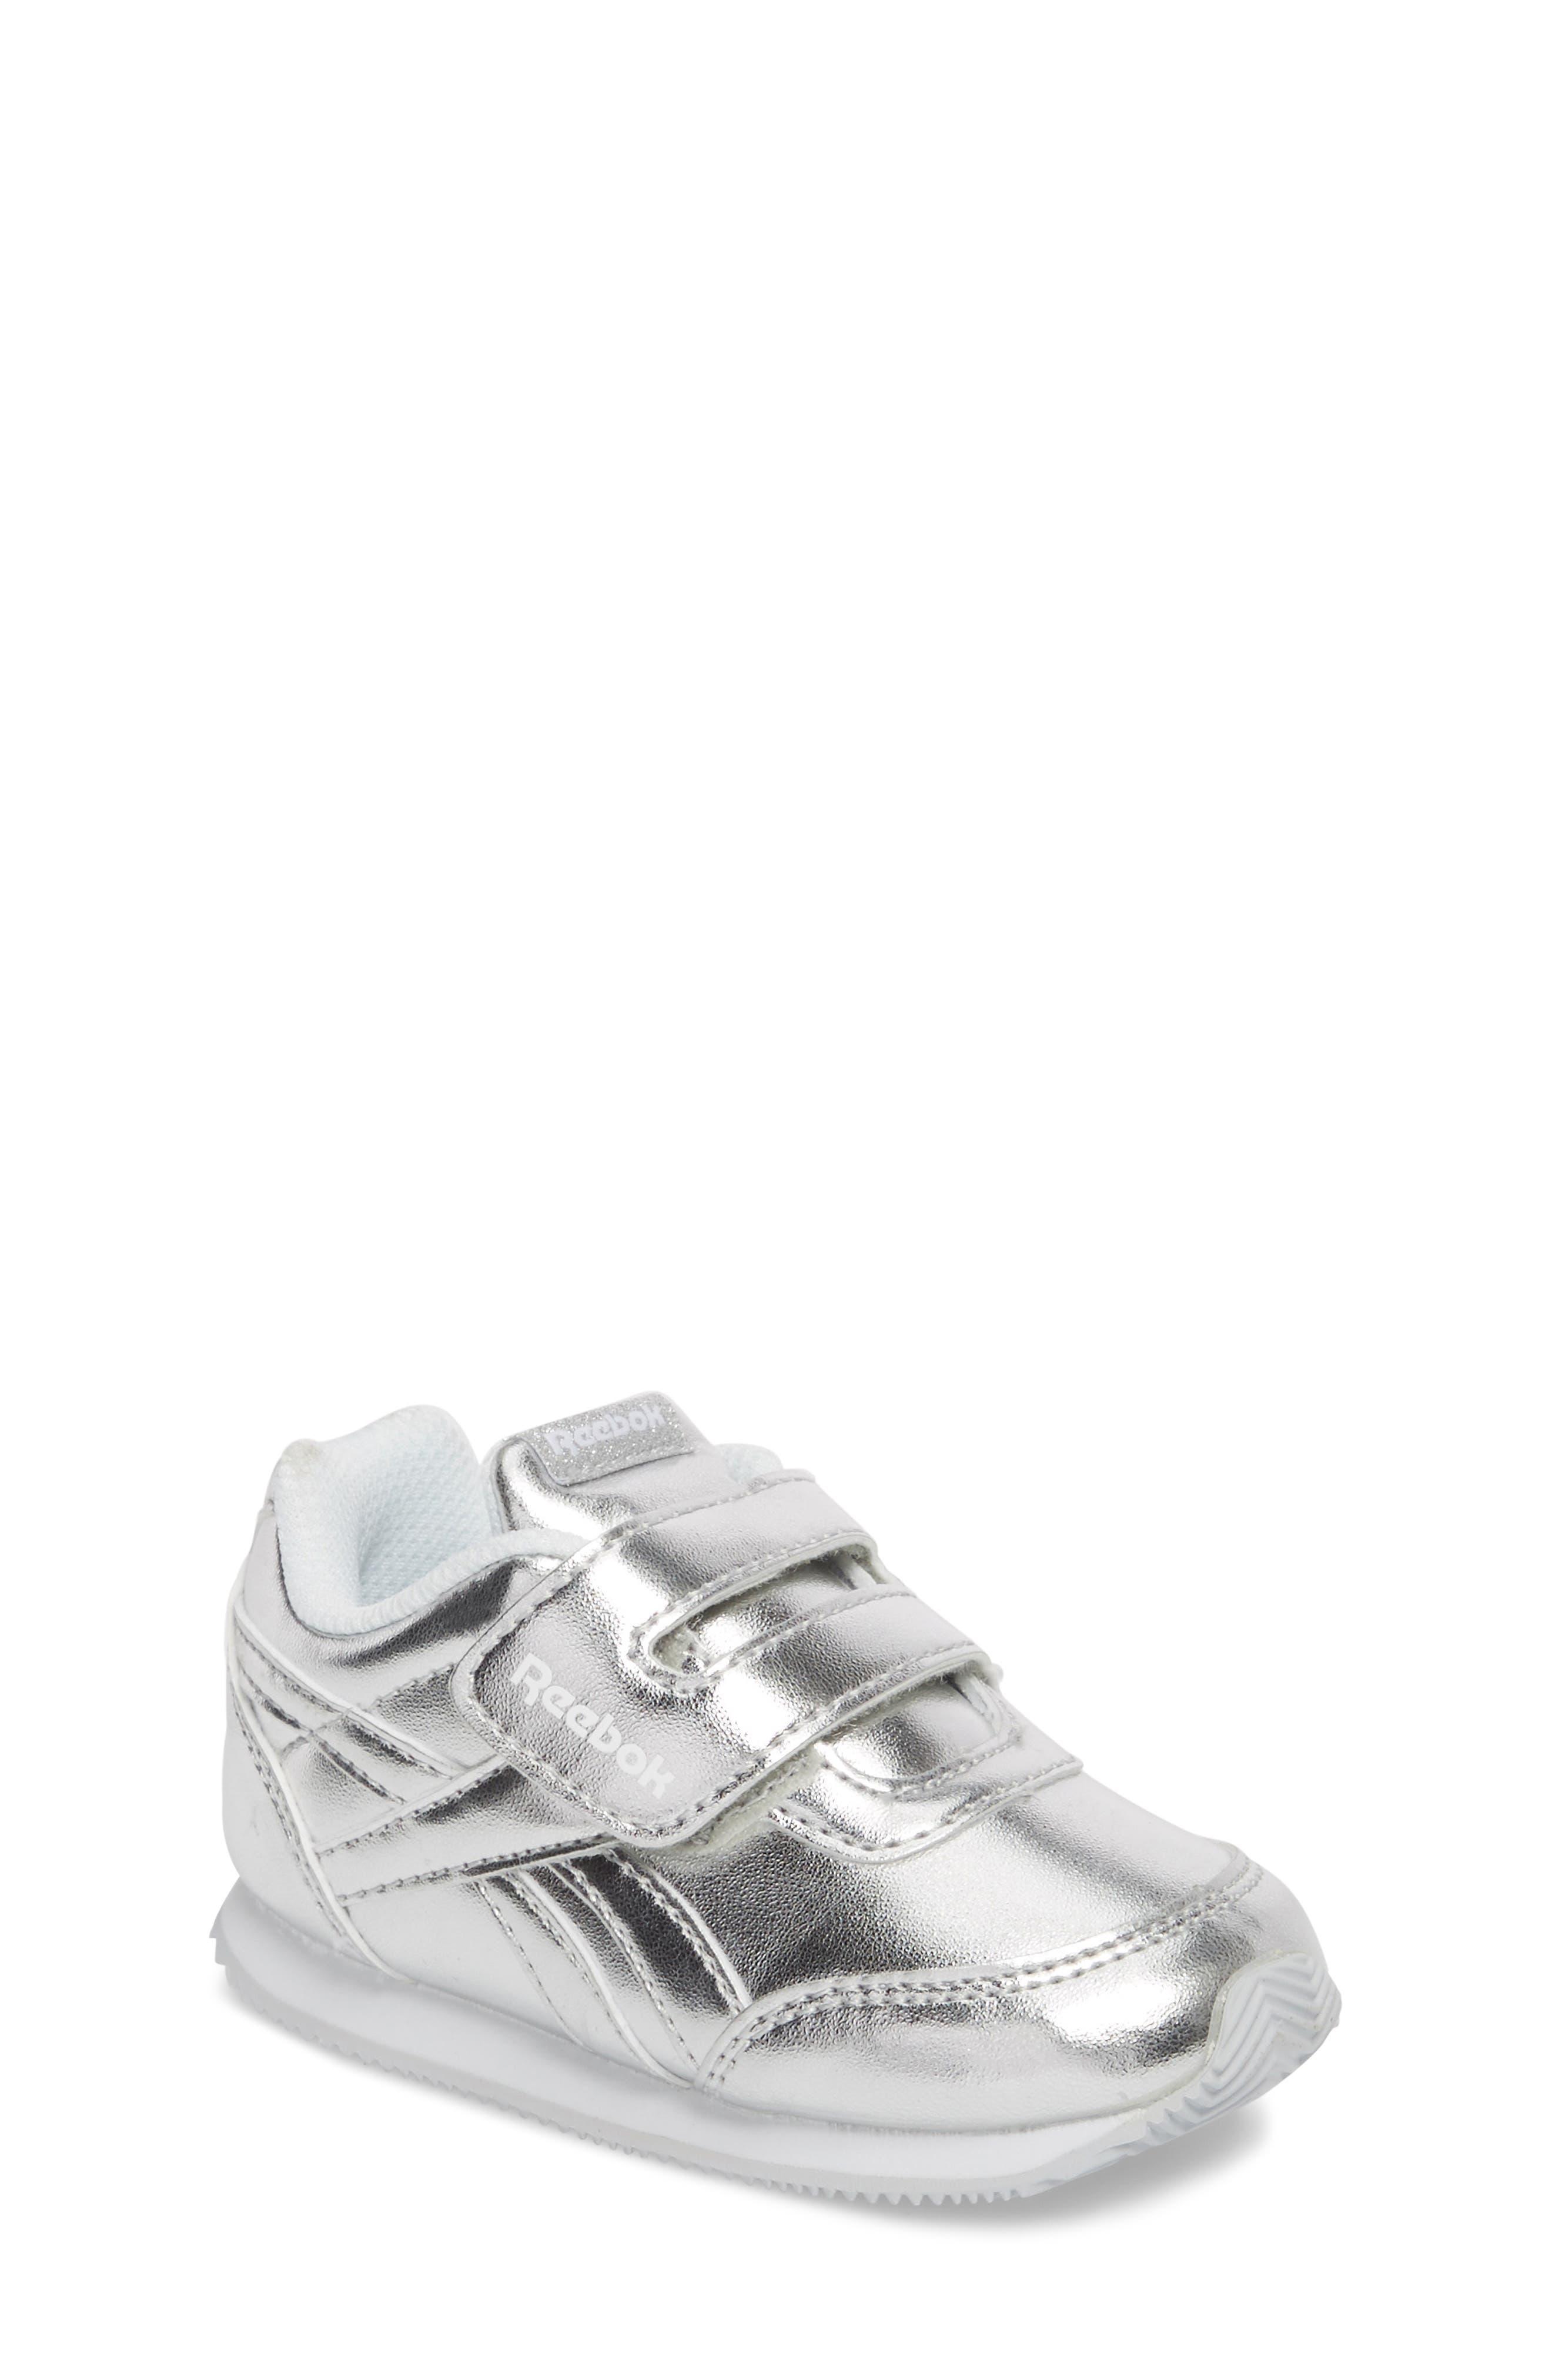 Royal Classic Jogger 2 Sneaker,                         Main,                         color, 040